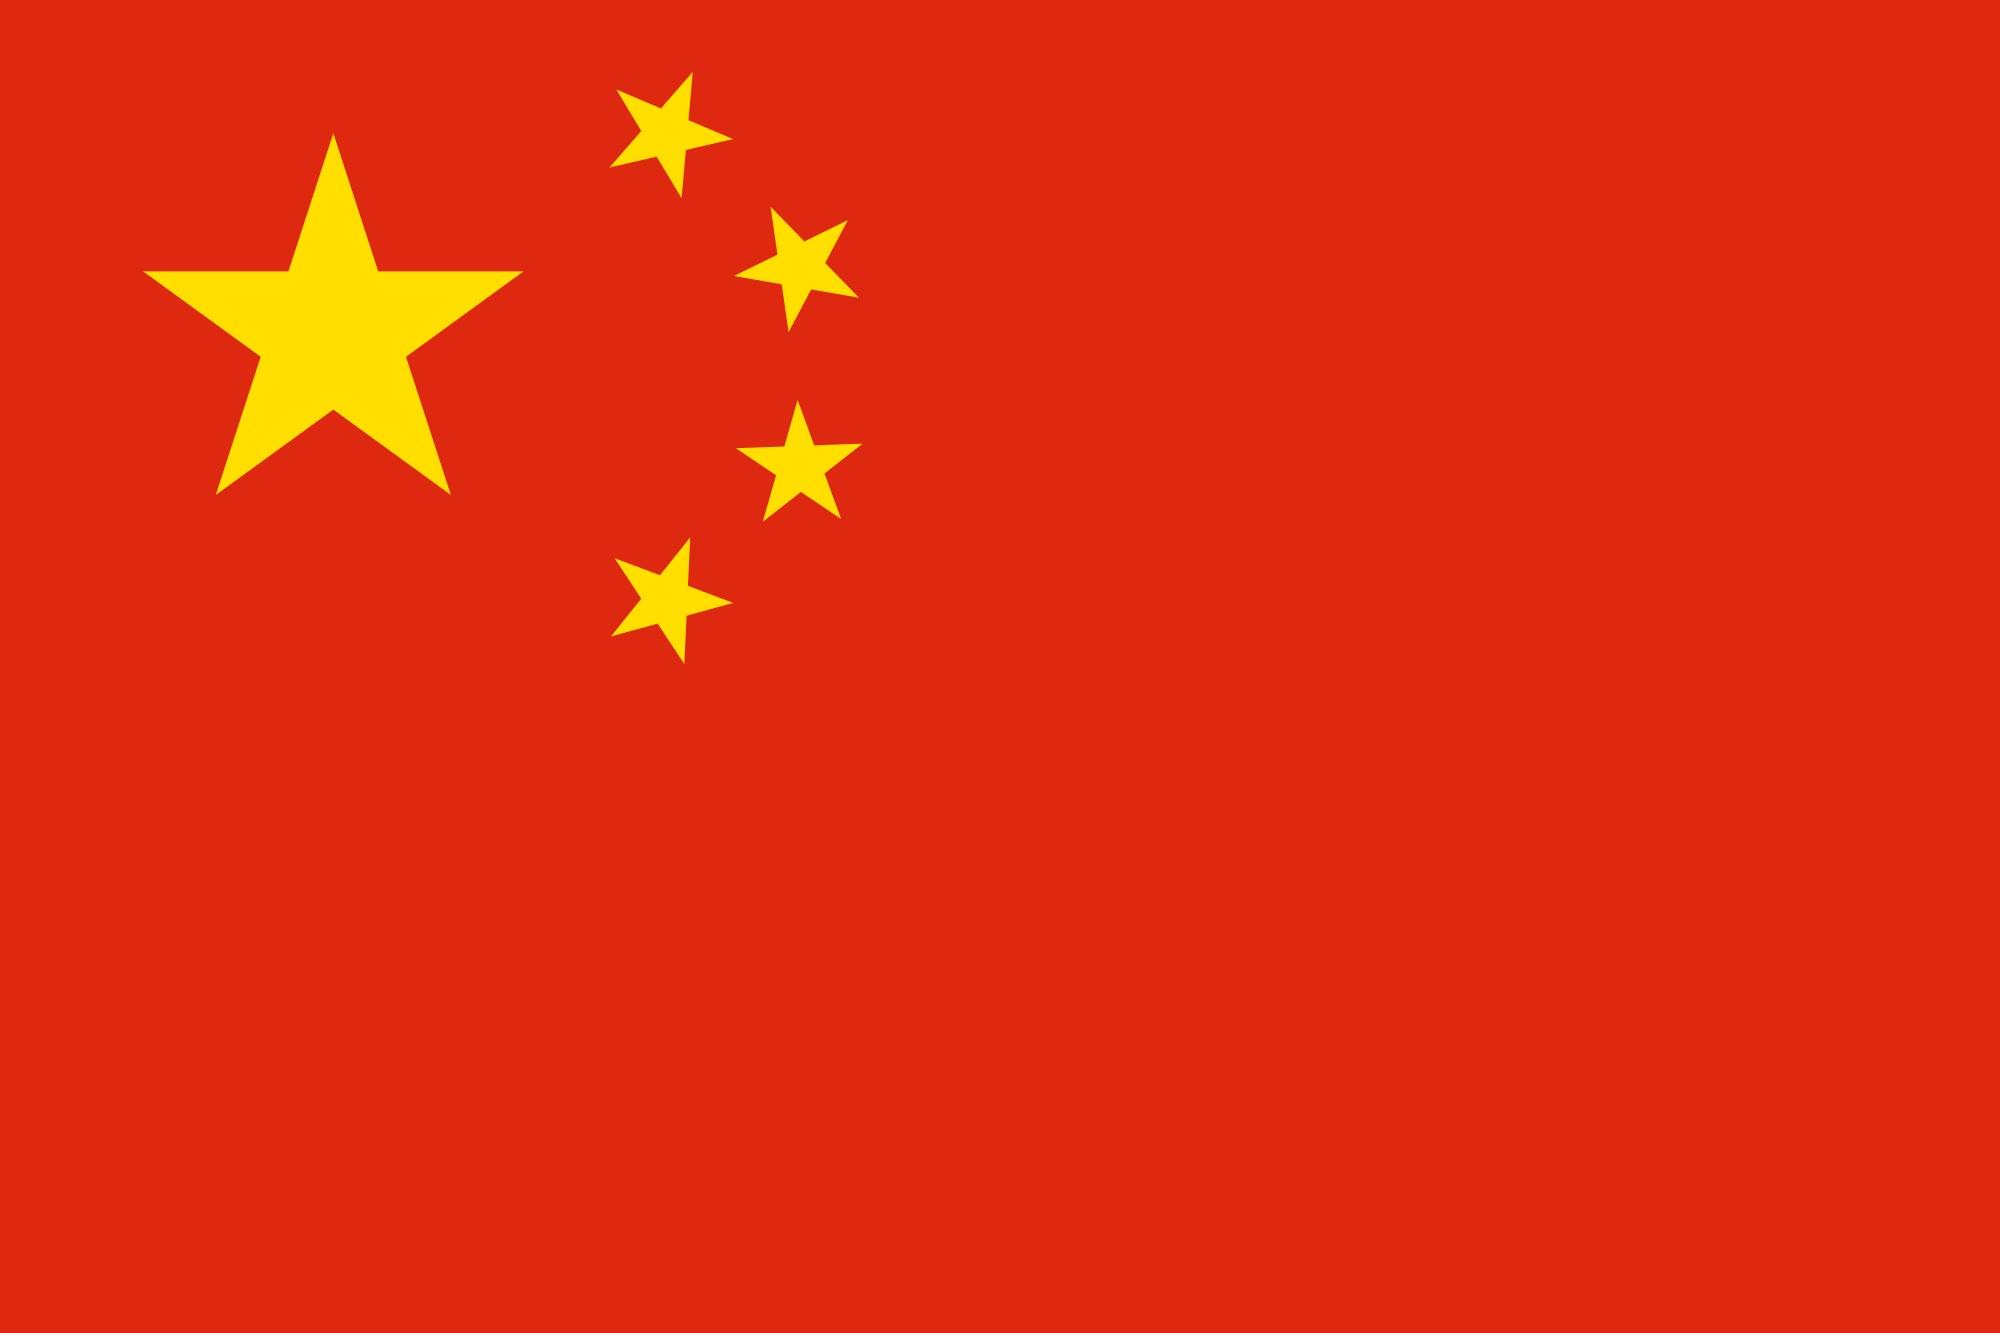 Tradução Simultânea, Consecutiva, Juramentada, Versão Idioma Chinês Mandarim